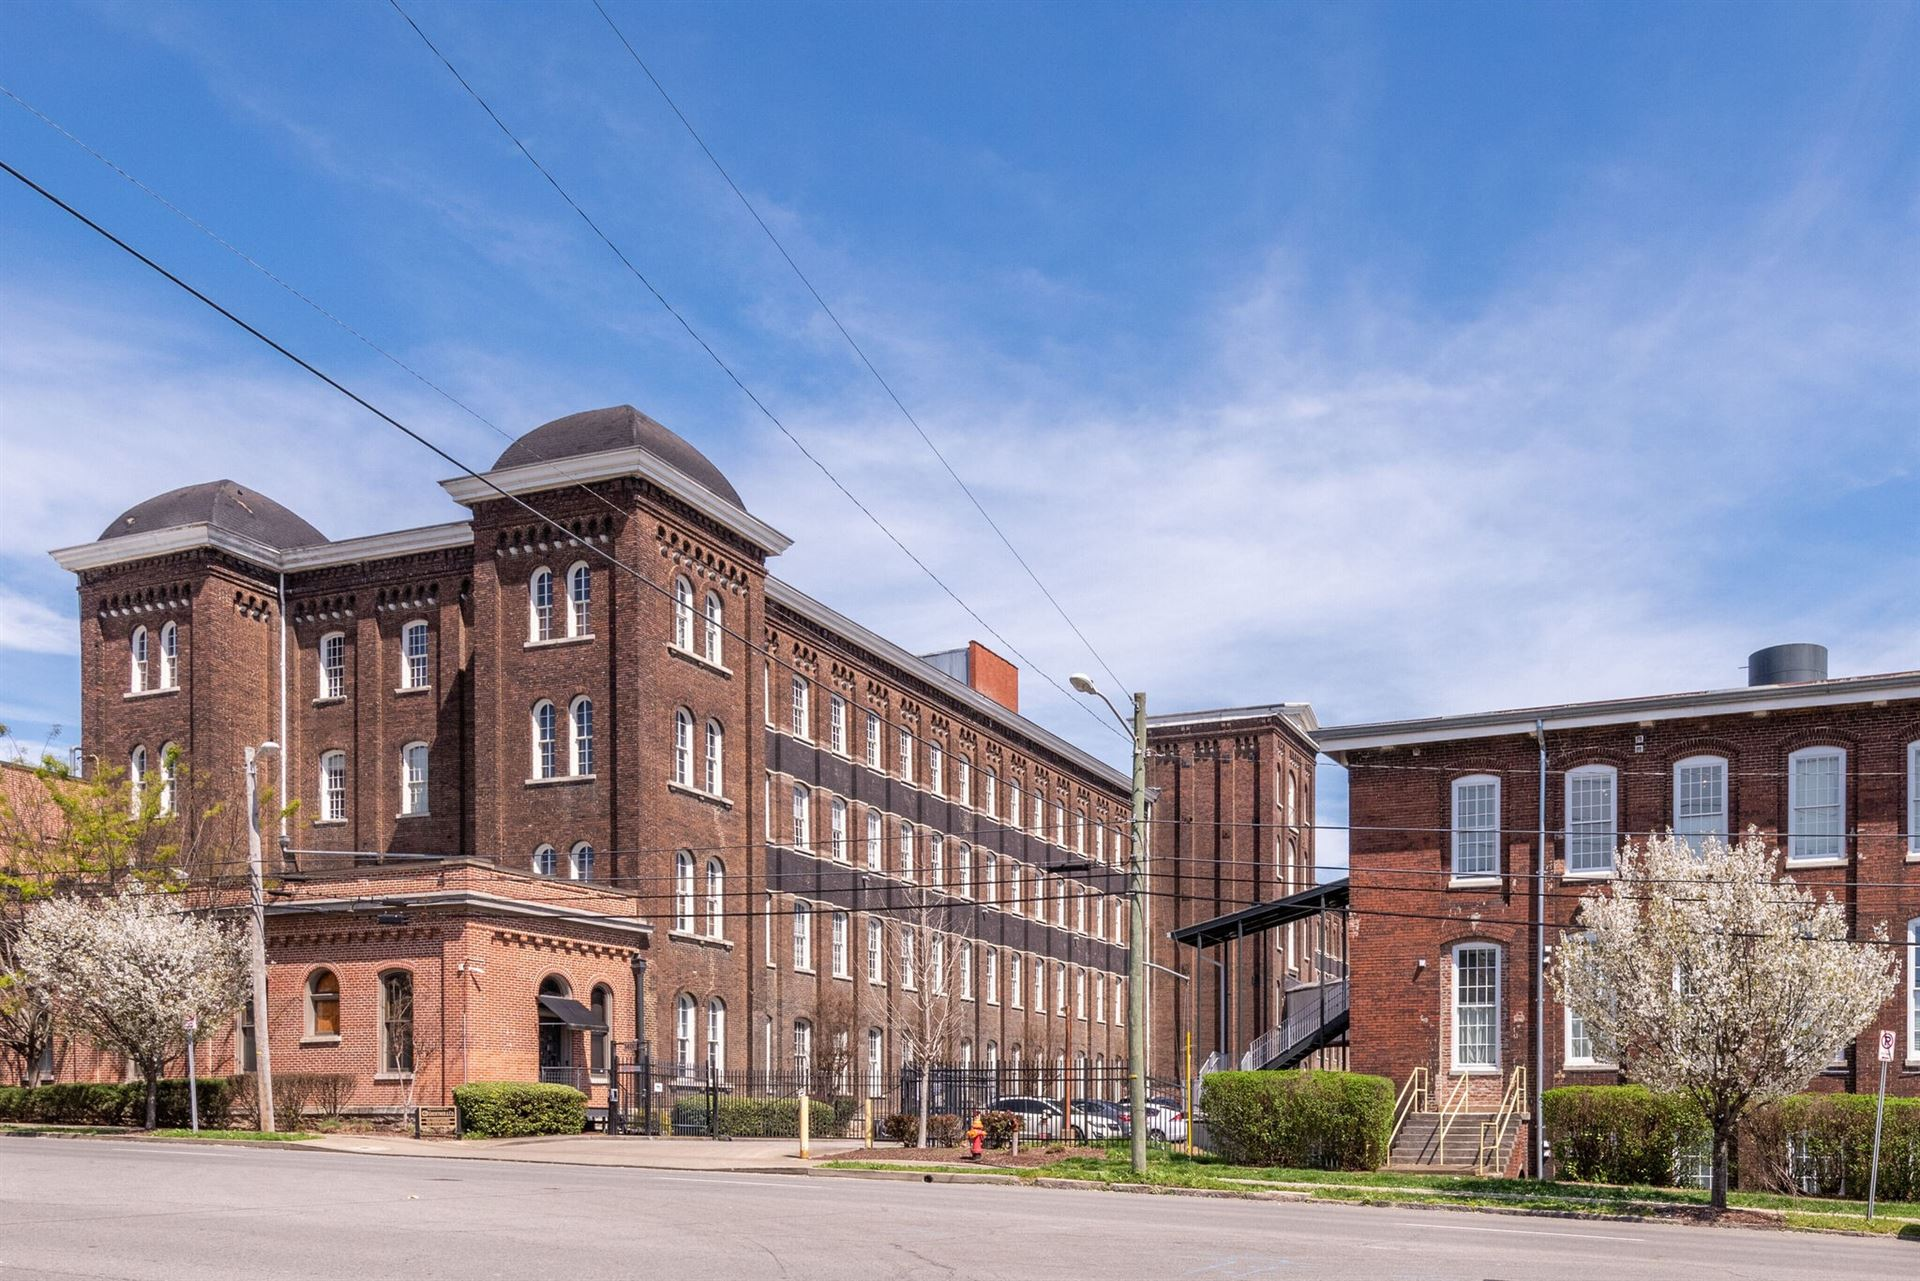 Photo of 1400 Rosa L Parks Blvd #223, Nashville, TN 37208 (MLS # 2249162)